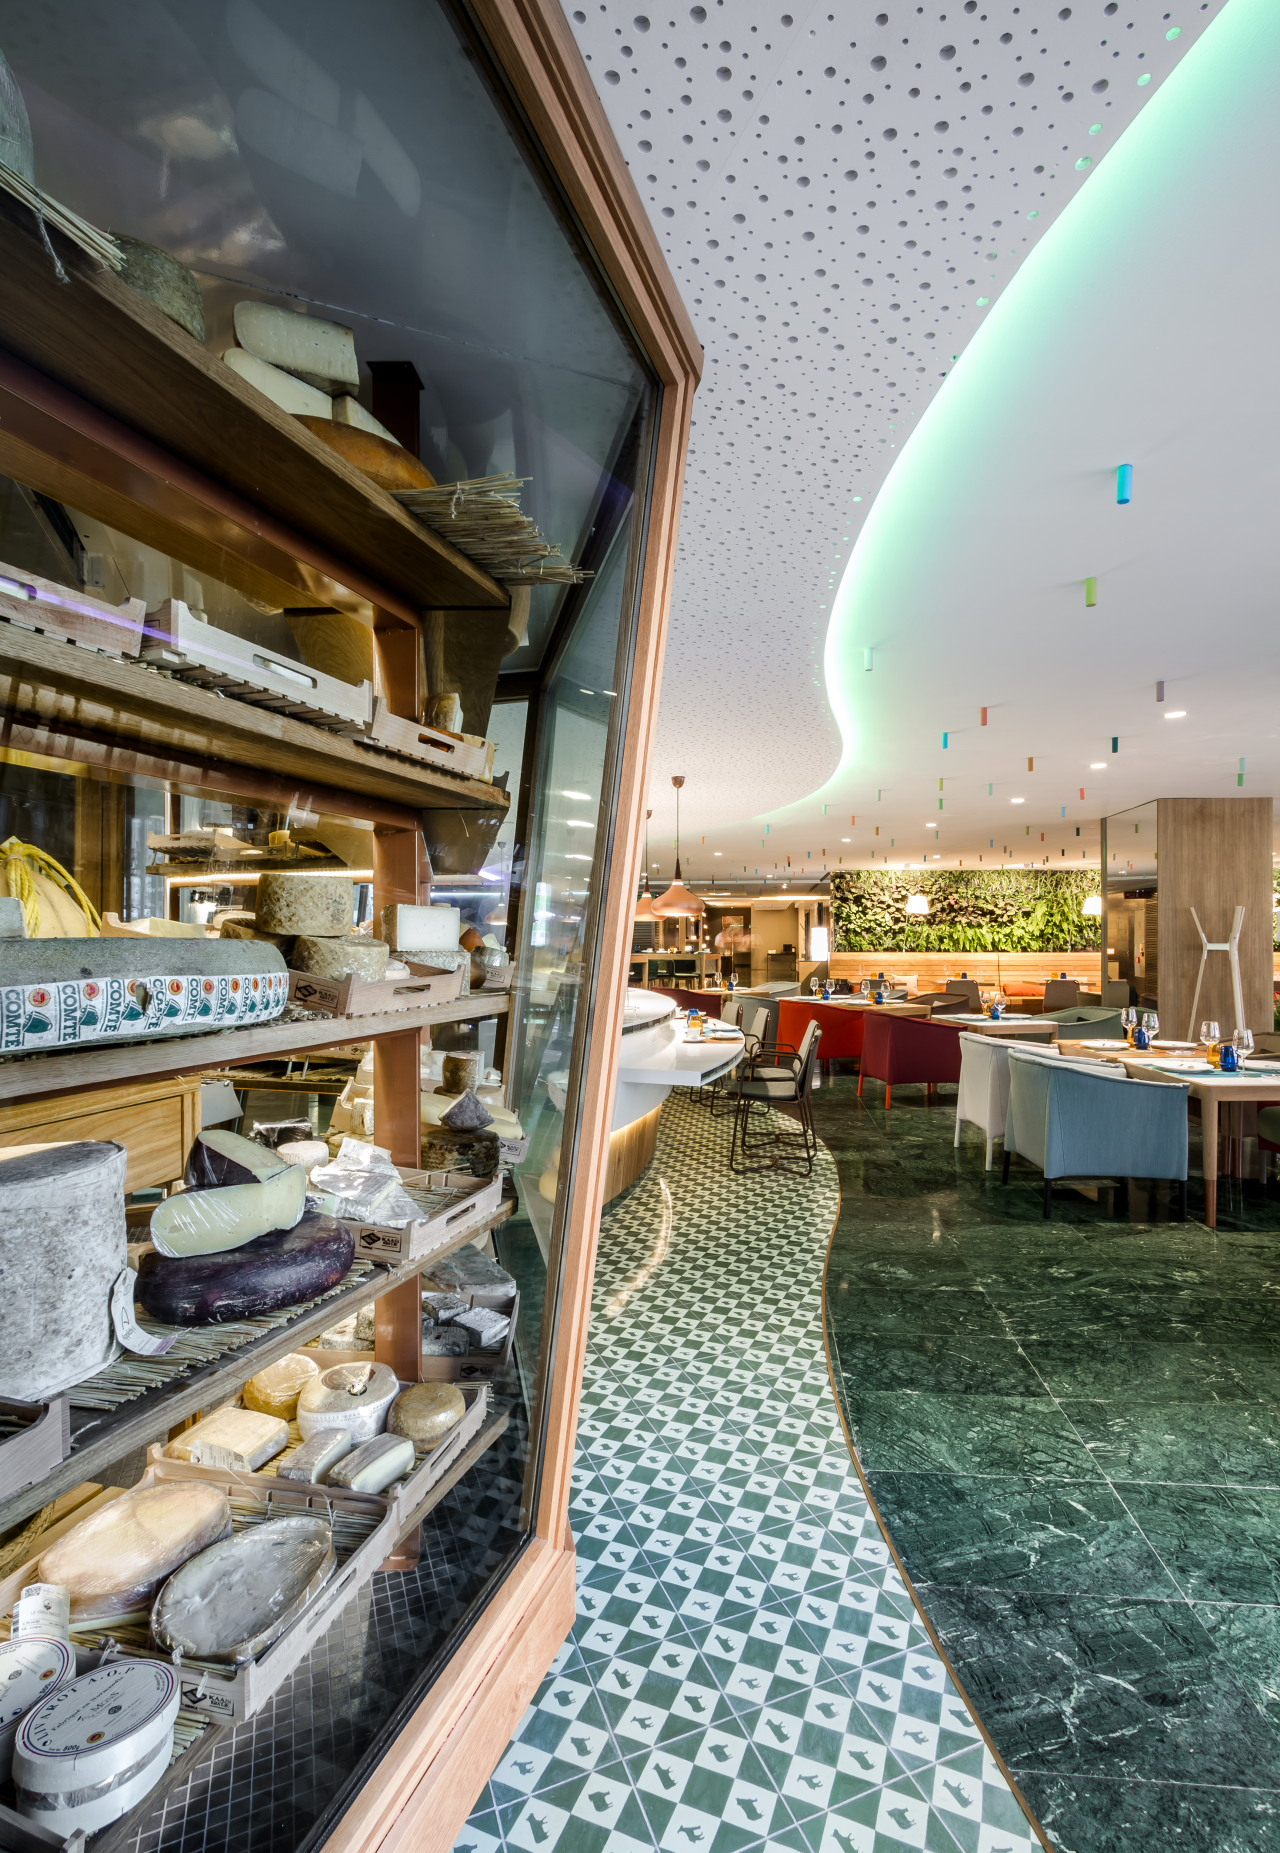 fotografia-arquitectura-valencia-german-cabo-estudihac-poncelet-cheese-bar-barcelona (18)